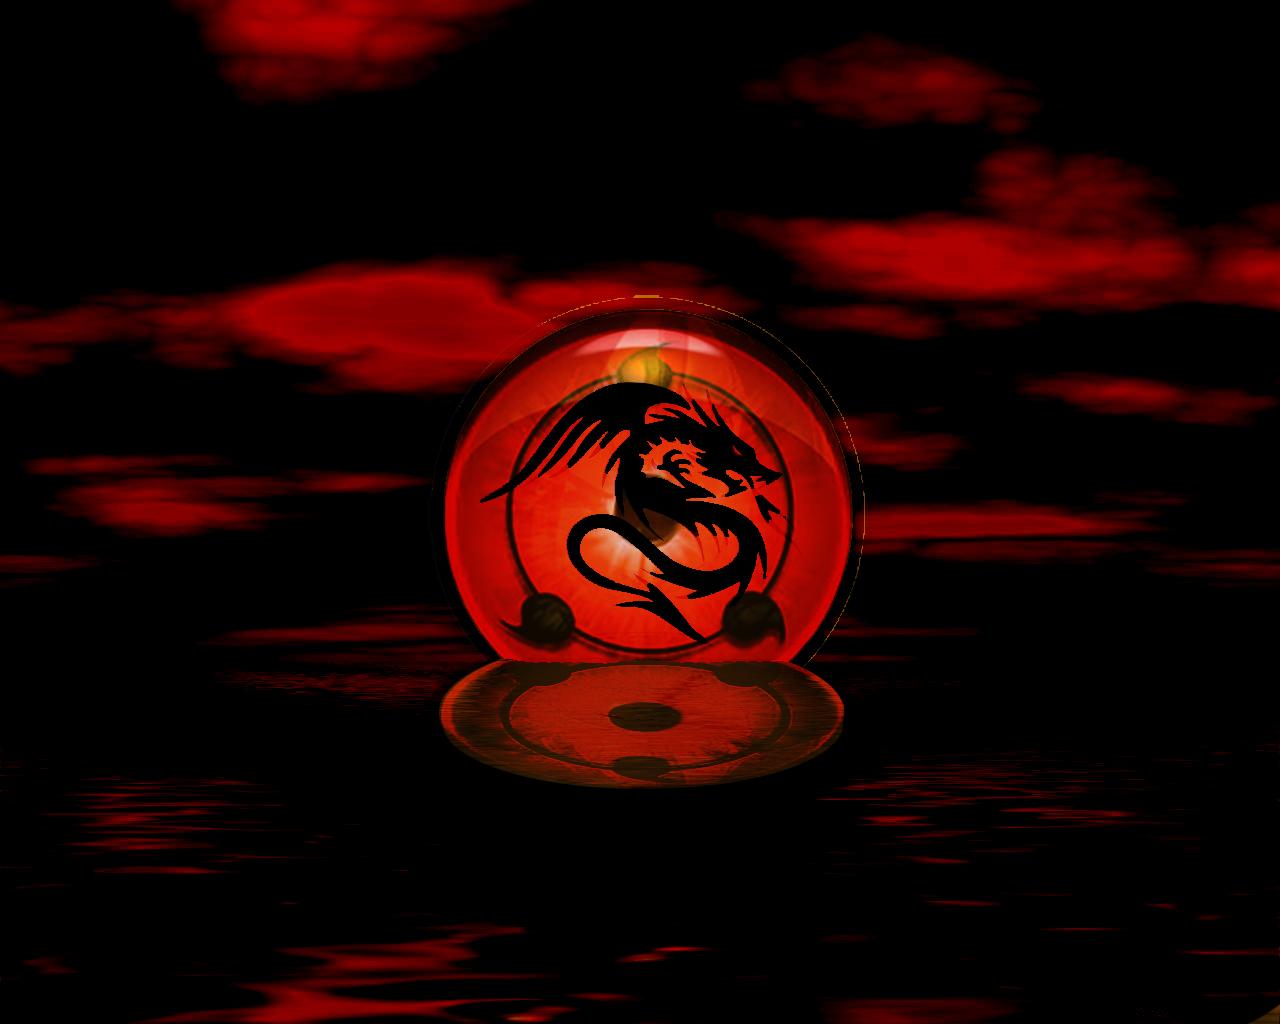 http://3.bp.blogspot.com/-QIhUF9aiJFY/T_dvp71CVCI/AAAAAAAAAow/m6HyQLSgk0g/s1600/red+dragon+sharingan.jpg